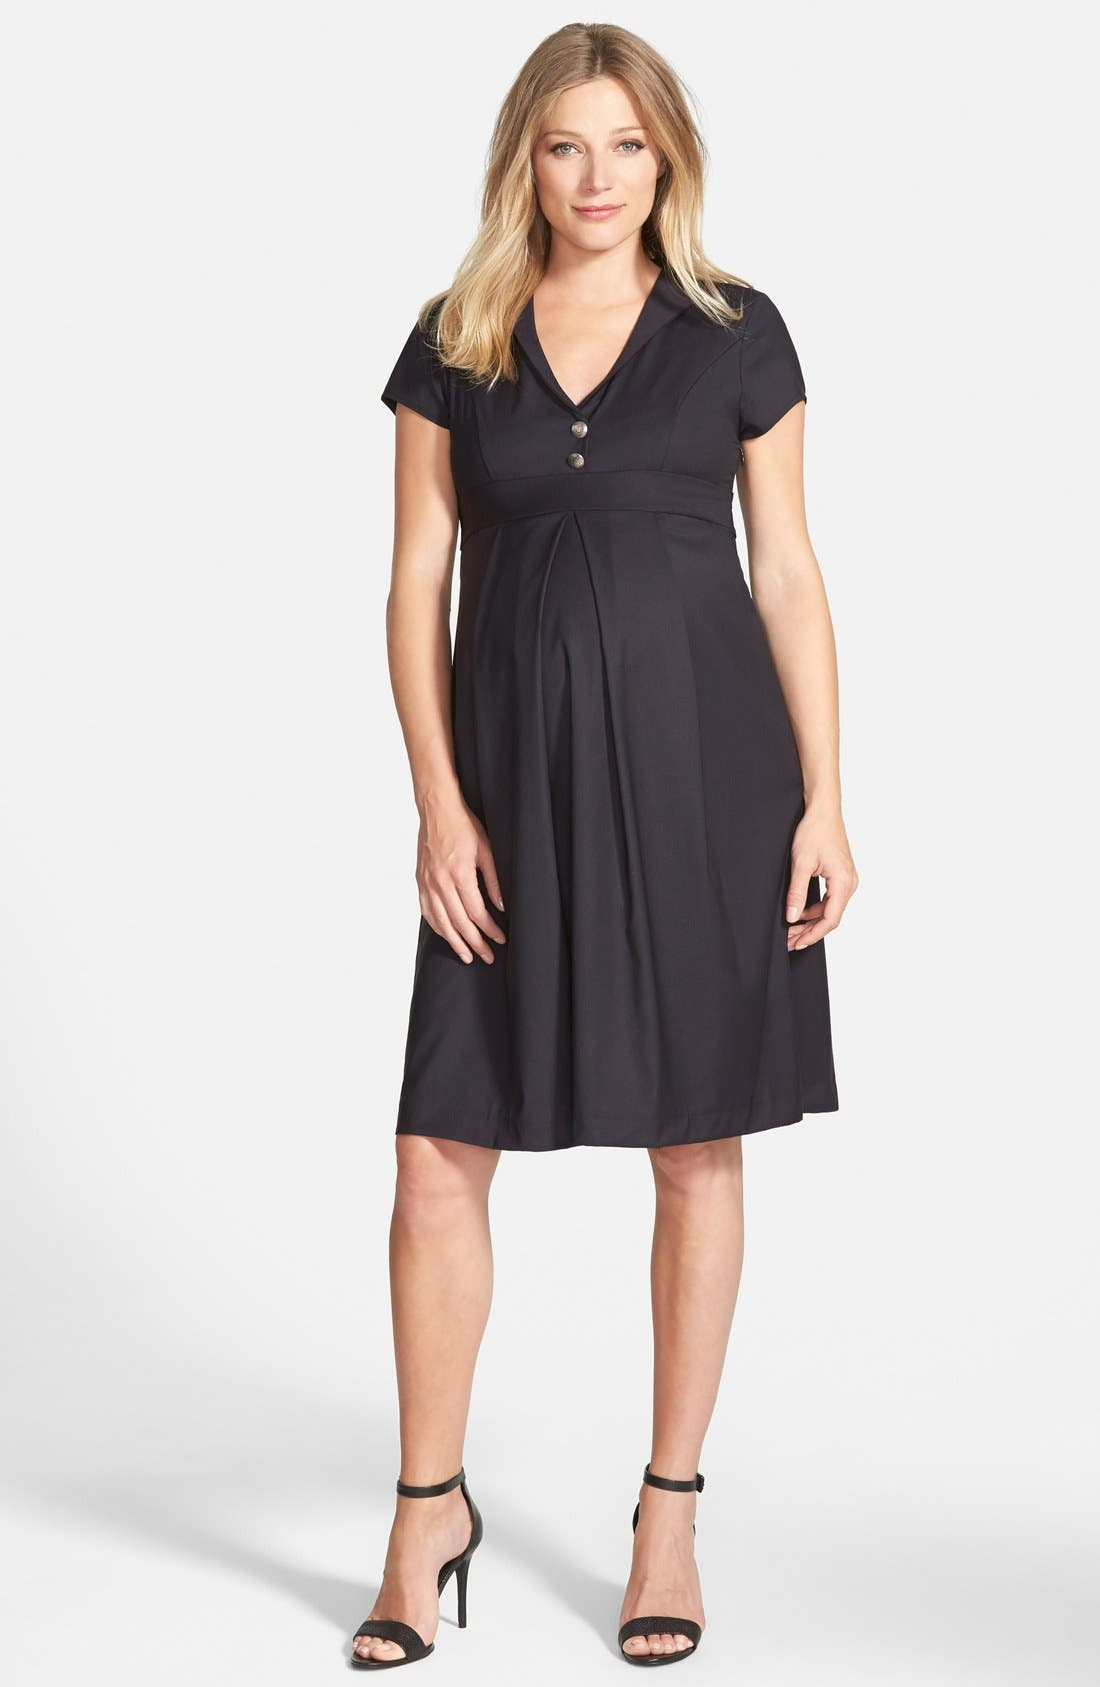 London 'Audrey' Maternity Dress,                         Main,                         color, Navy